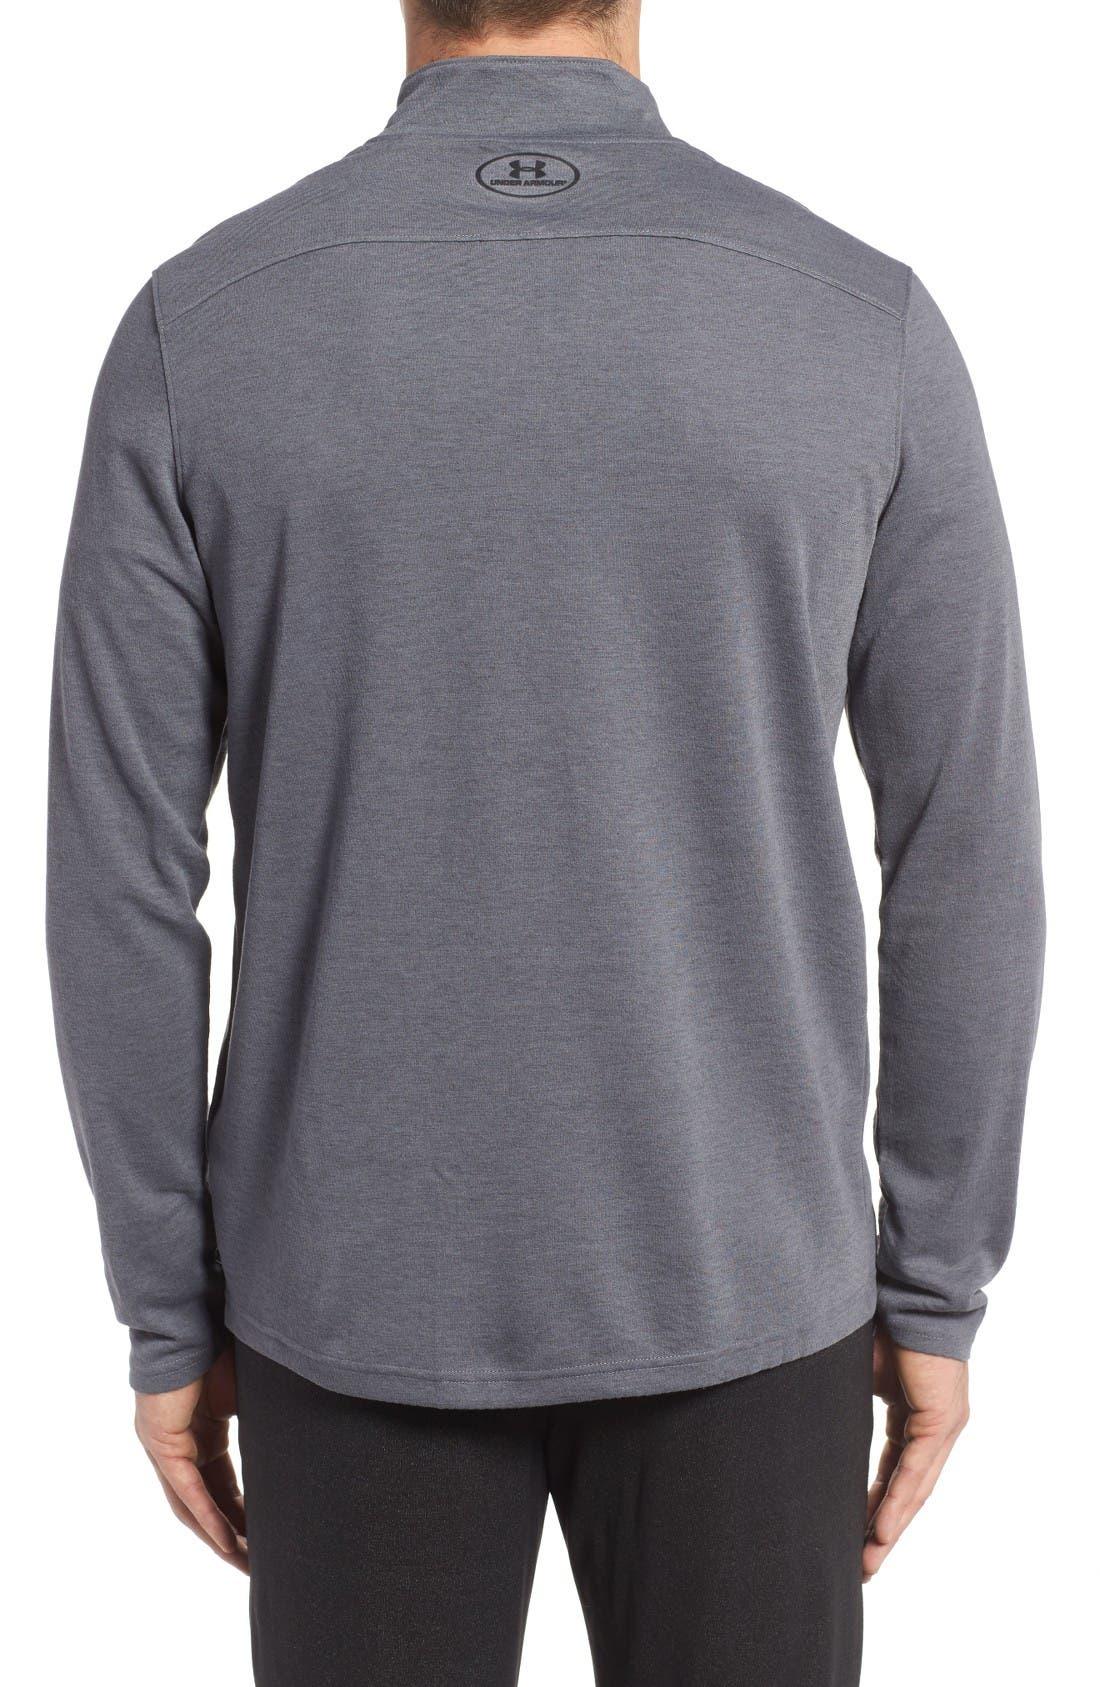 Alternate Image 2  - Under Armour ColdGear® Quarter-Zip Pullover